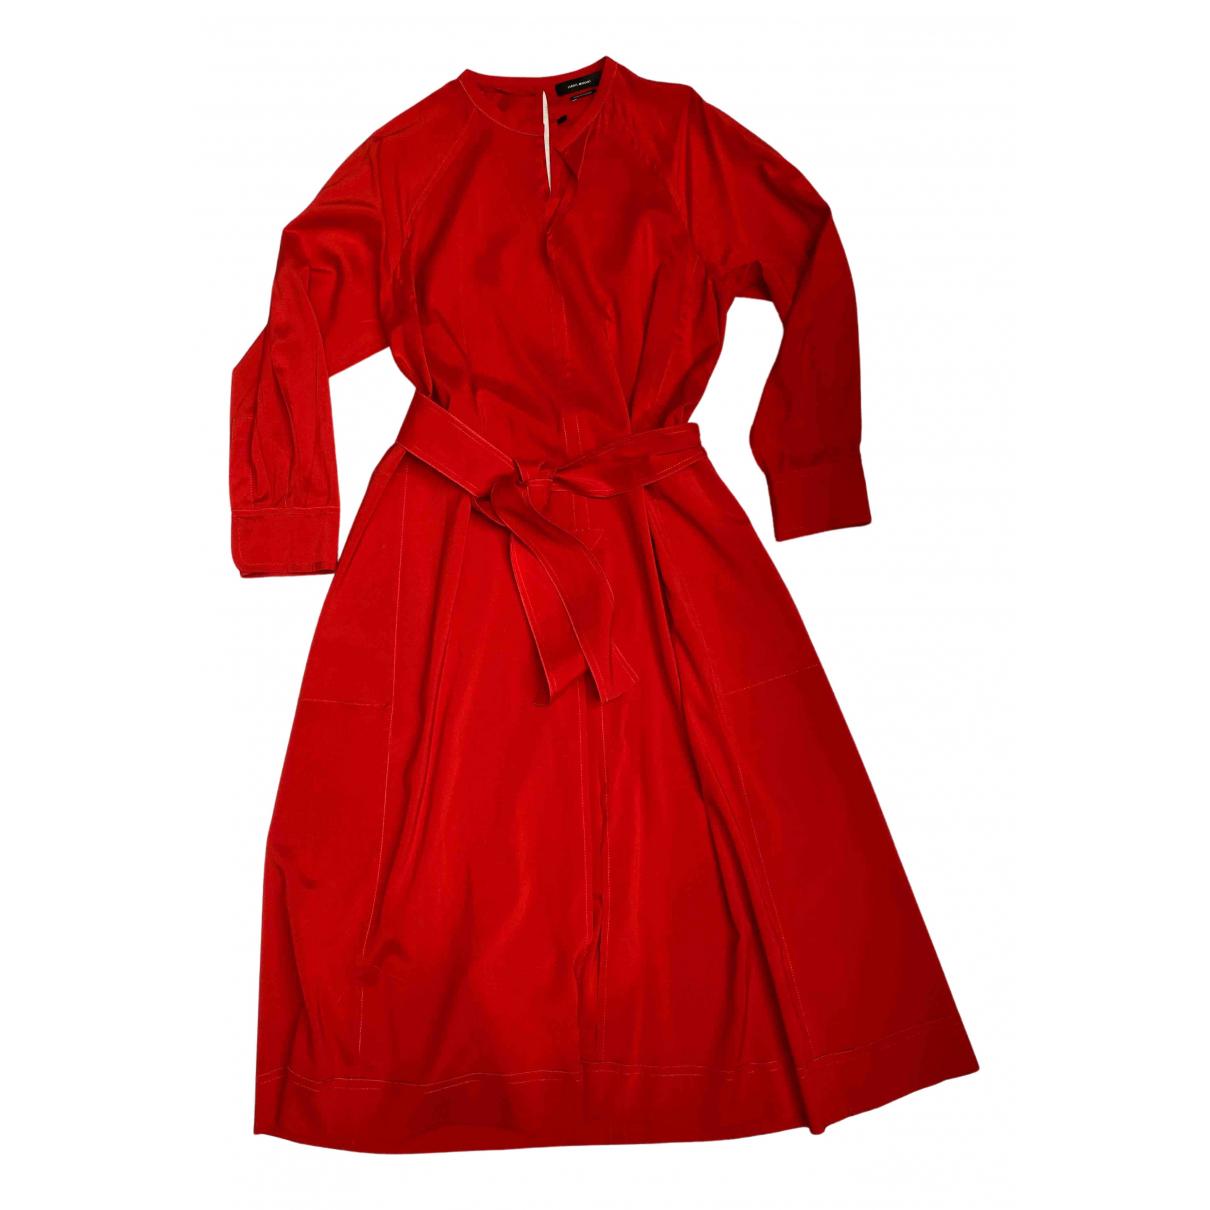 Isabel Marant N Red Silk dress for Women 42 FR